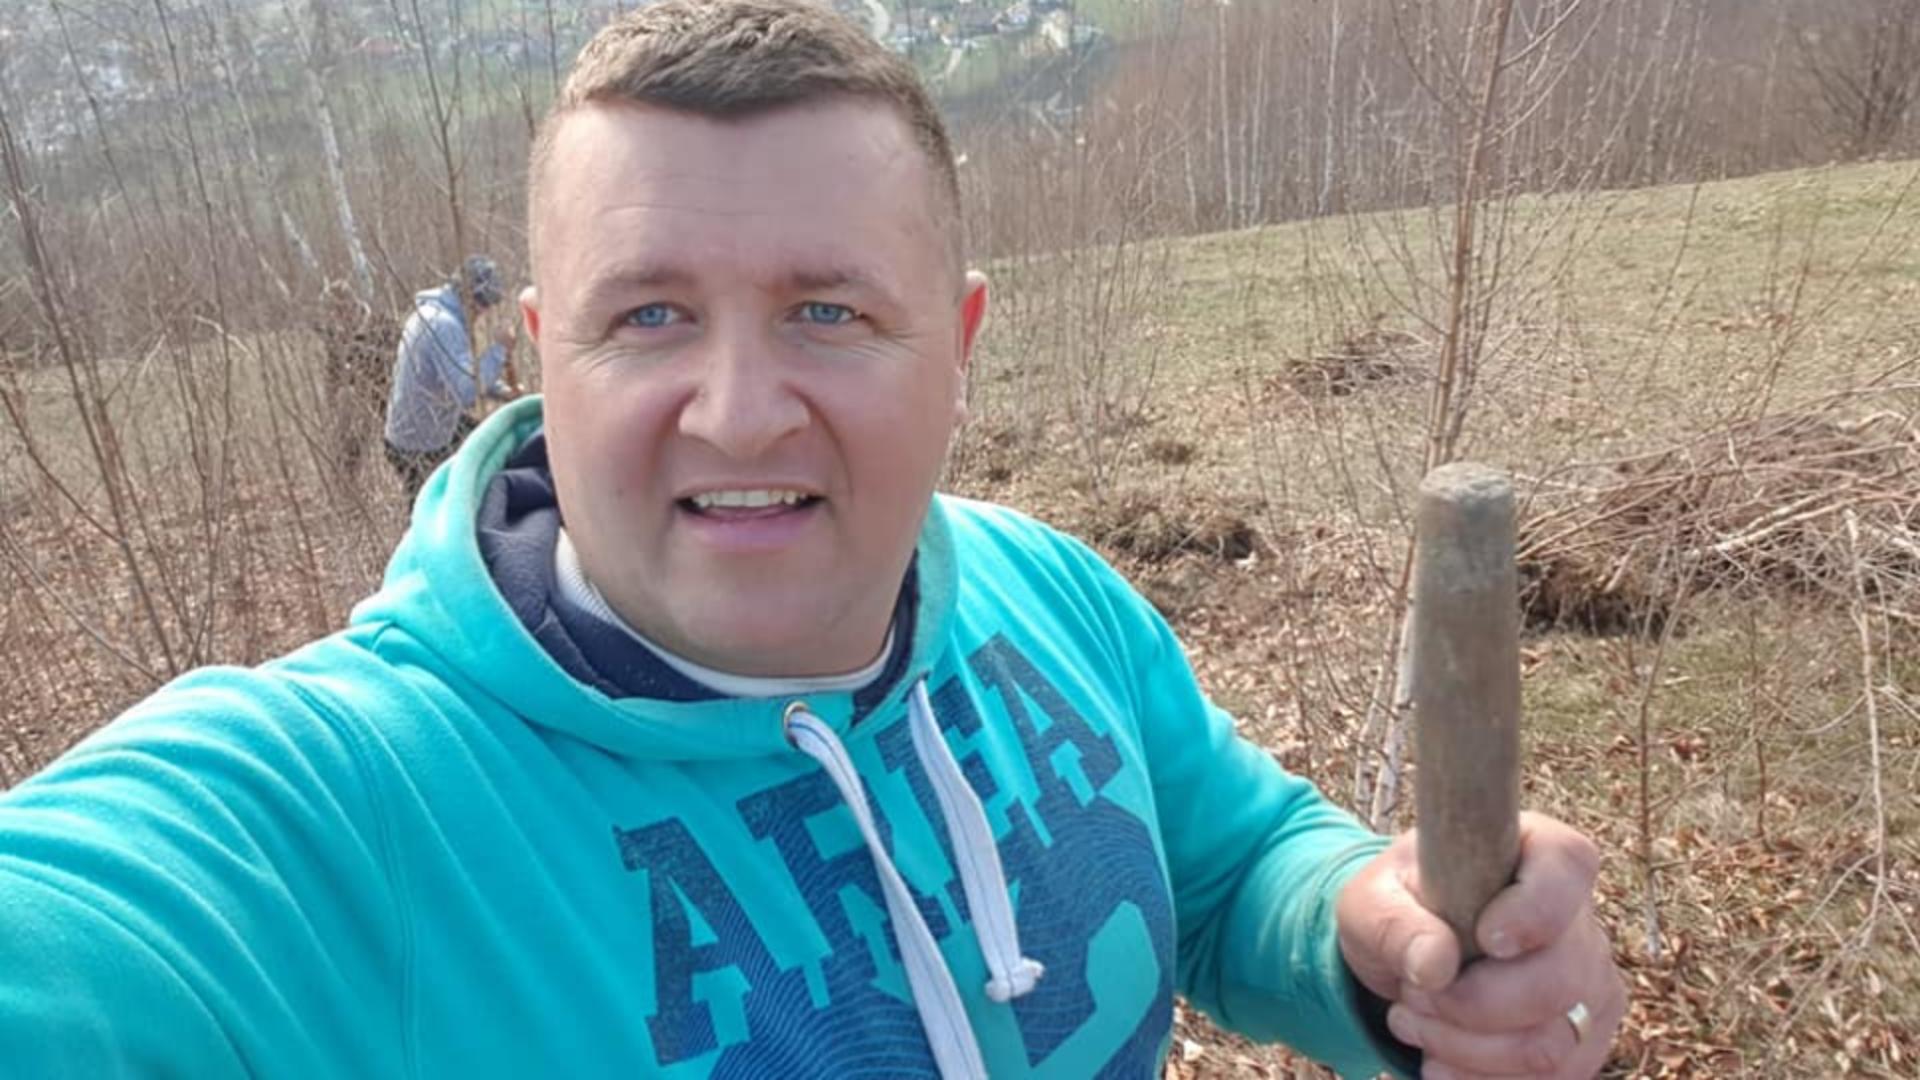 Cpirian Robert Tamaș, primar comuna Șuletea, jud. Vaslui / Foto: Facebook